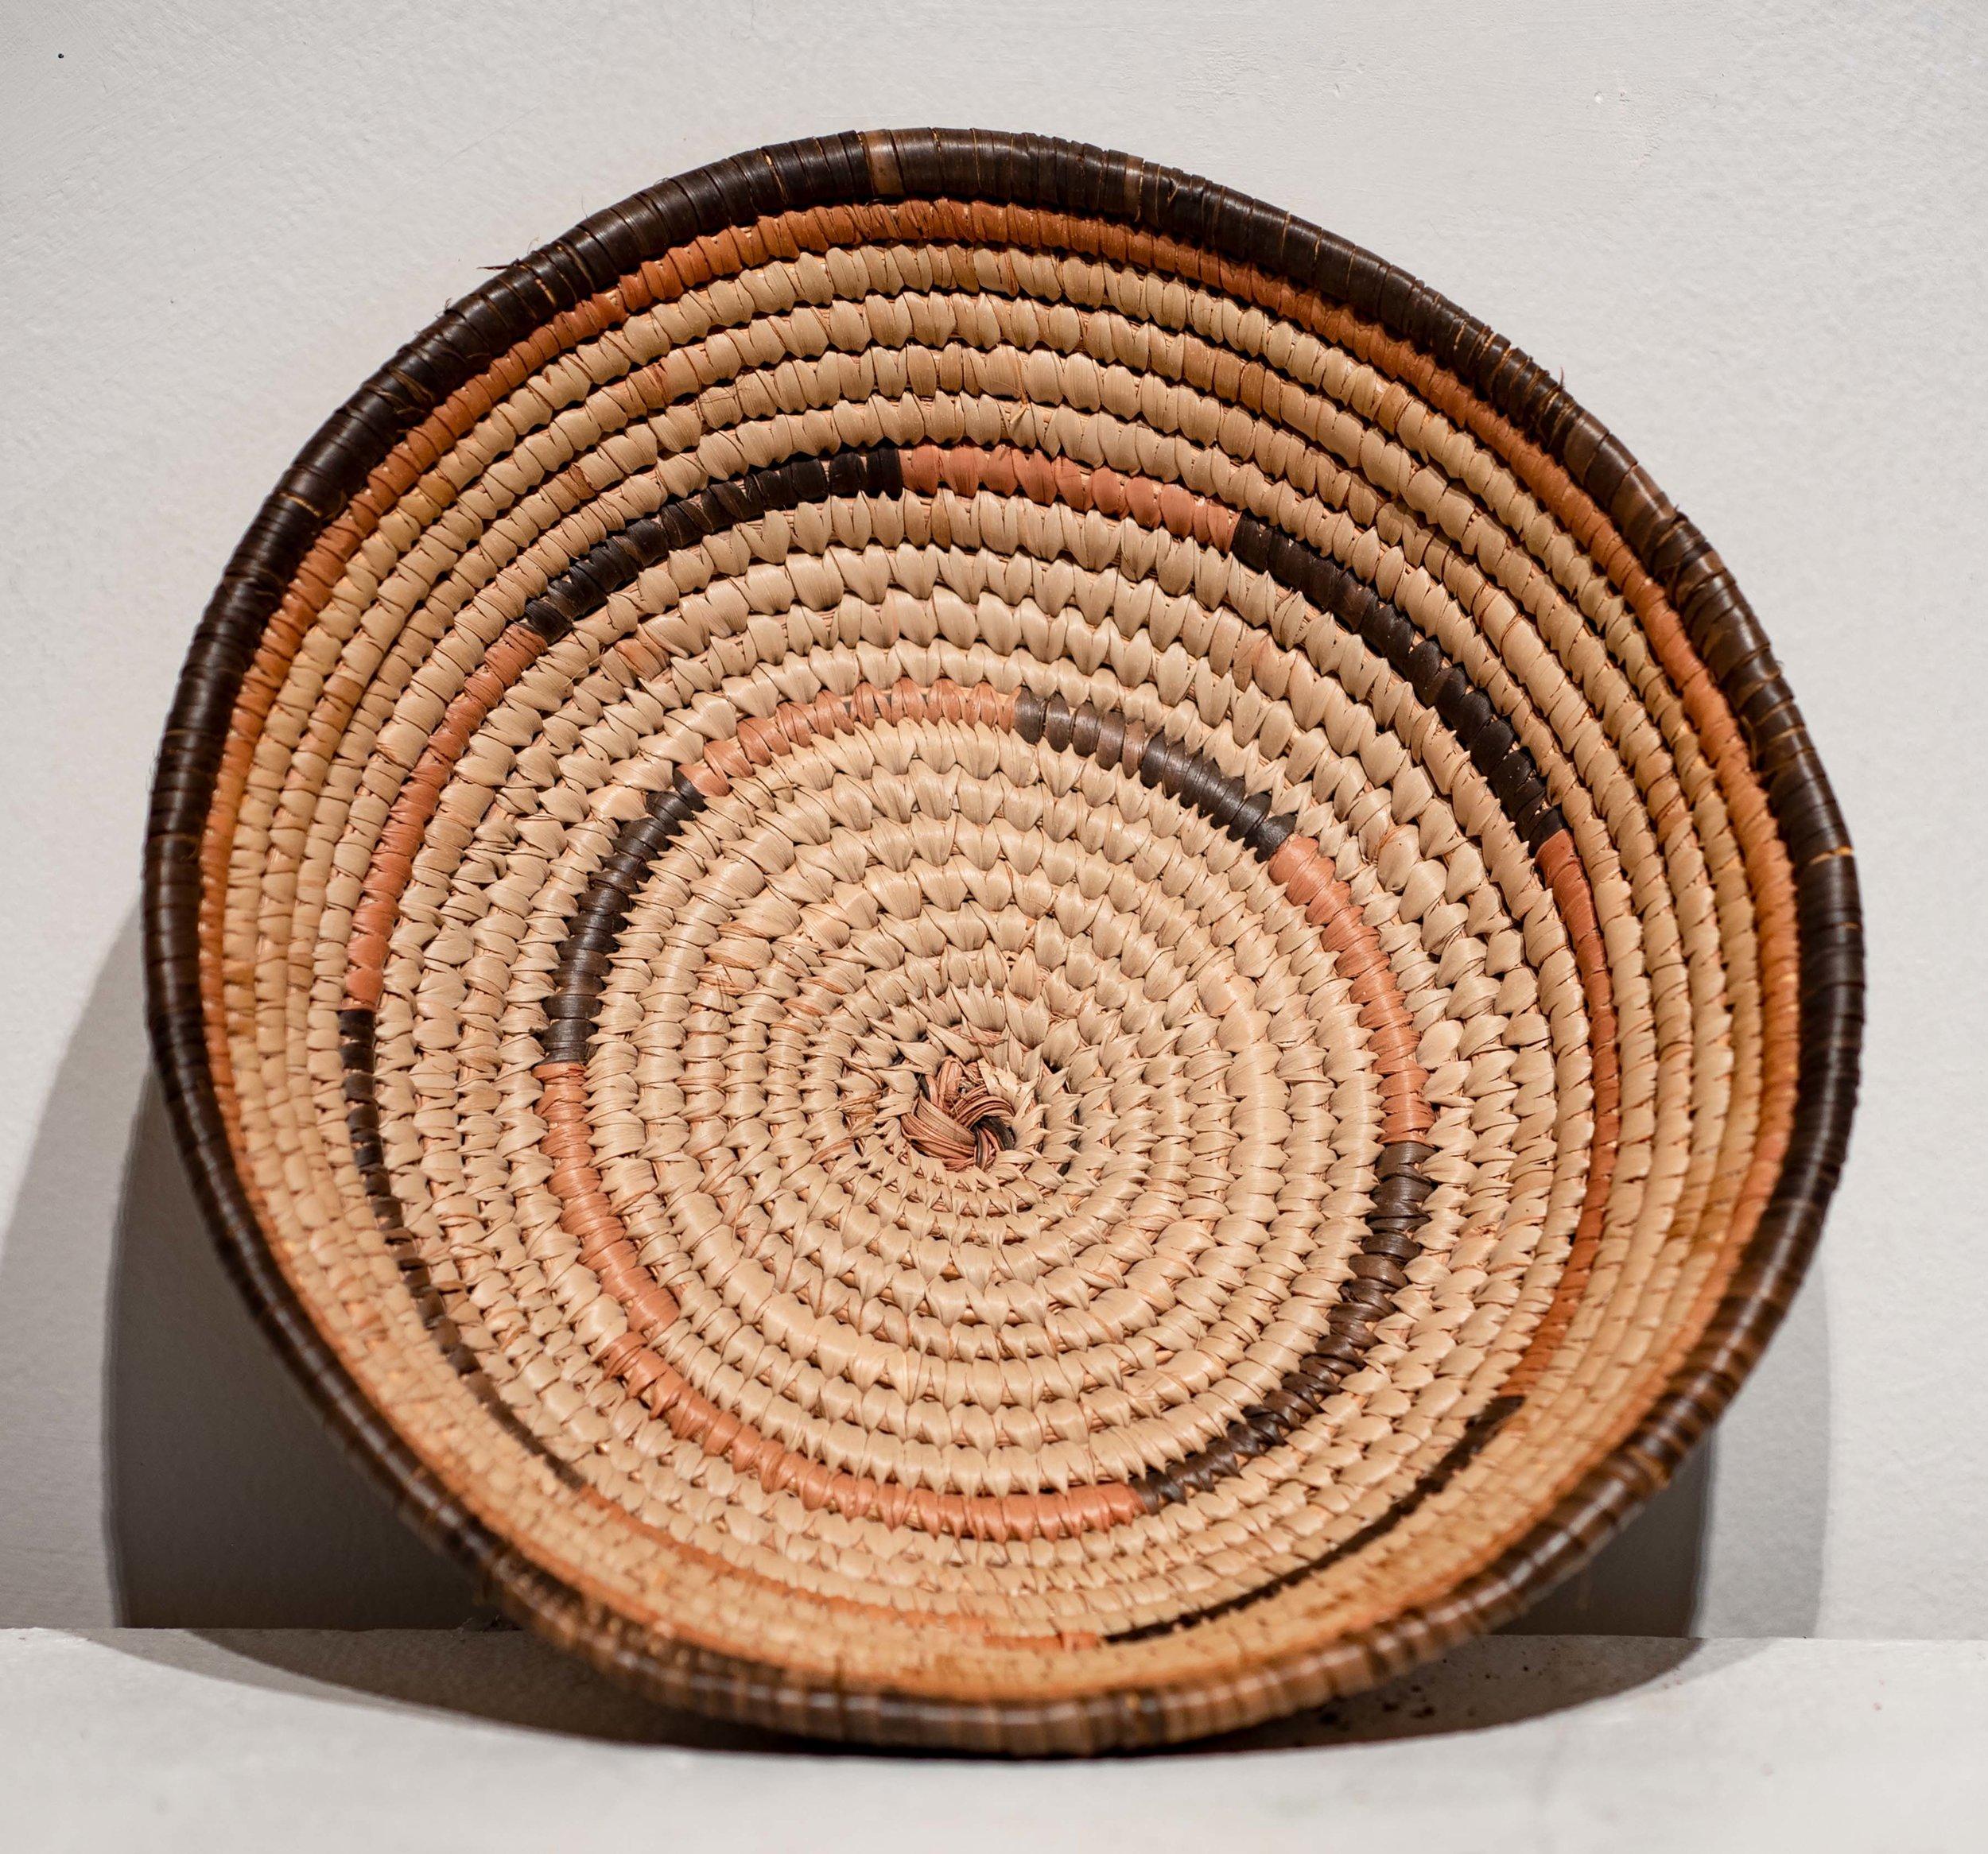 46. Navajo? Woven Basket